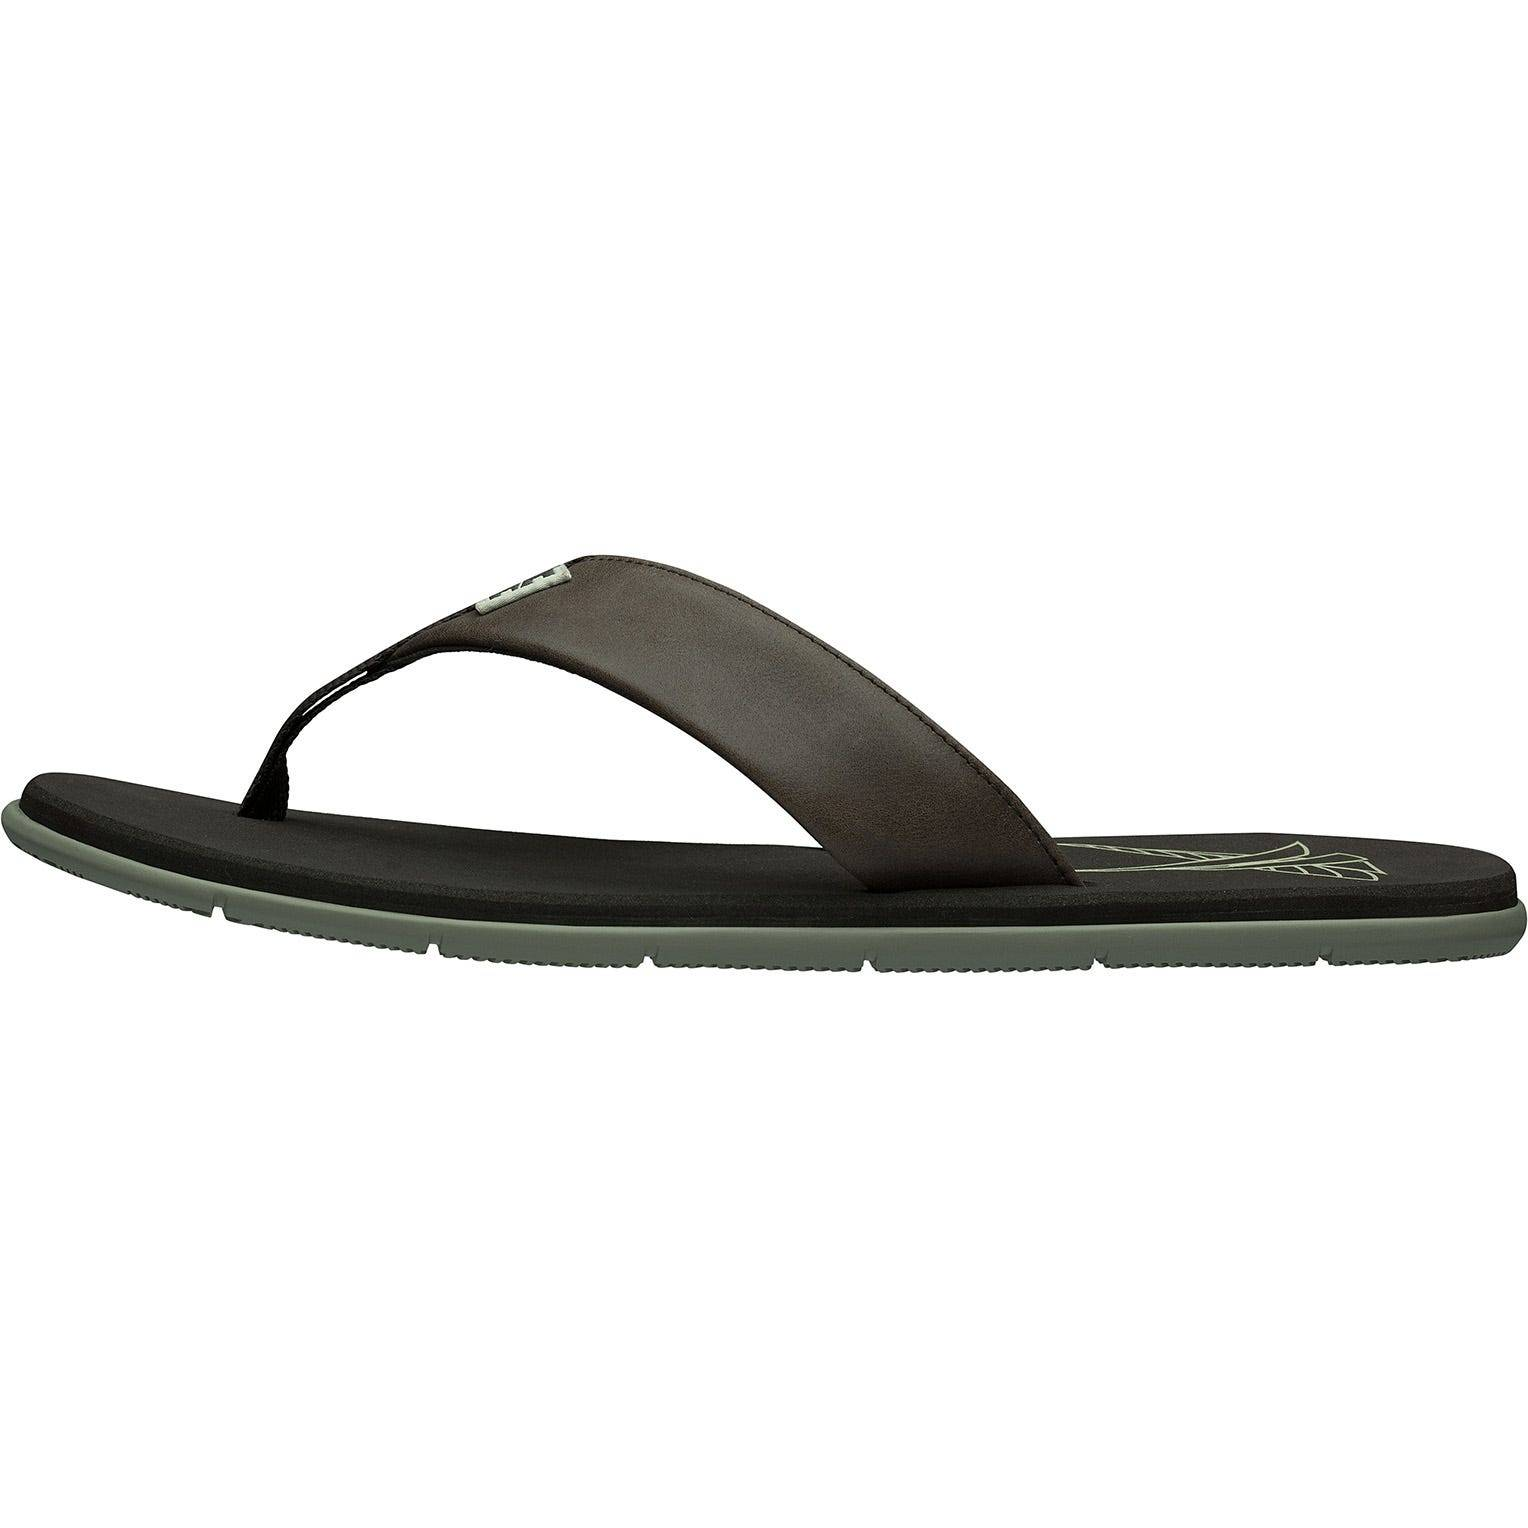 Helly Hansen Seasand Leather Sandal Mens Brown 40/7